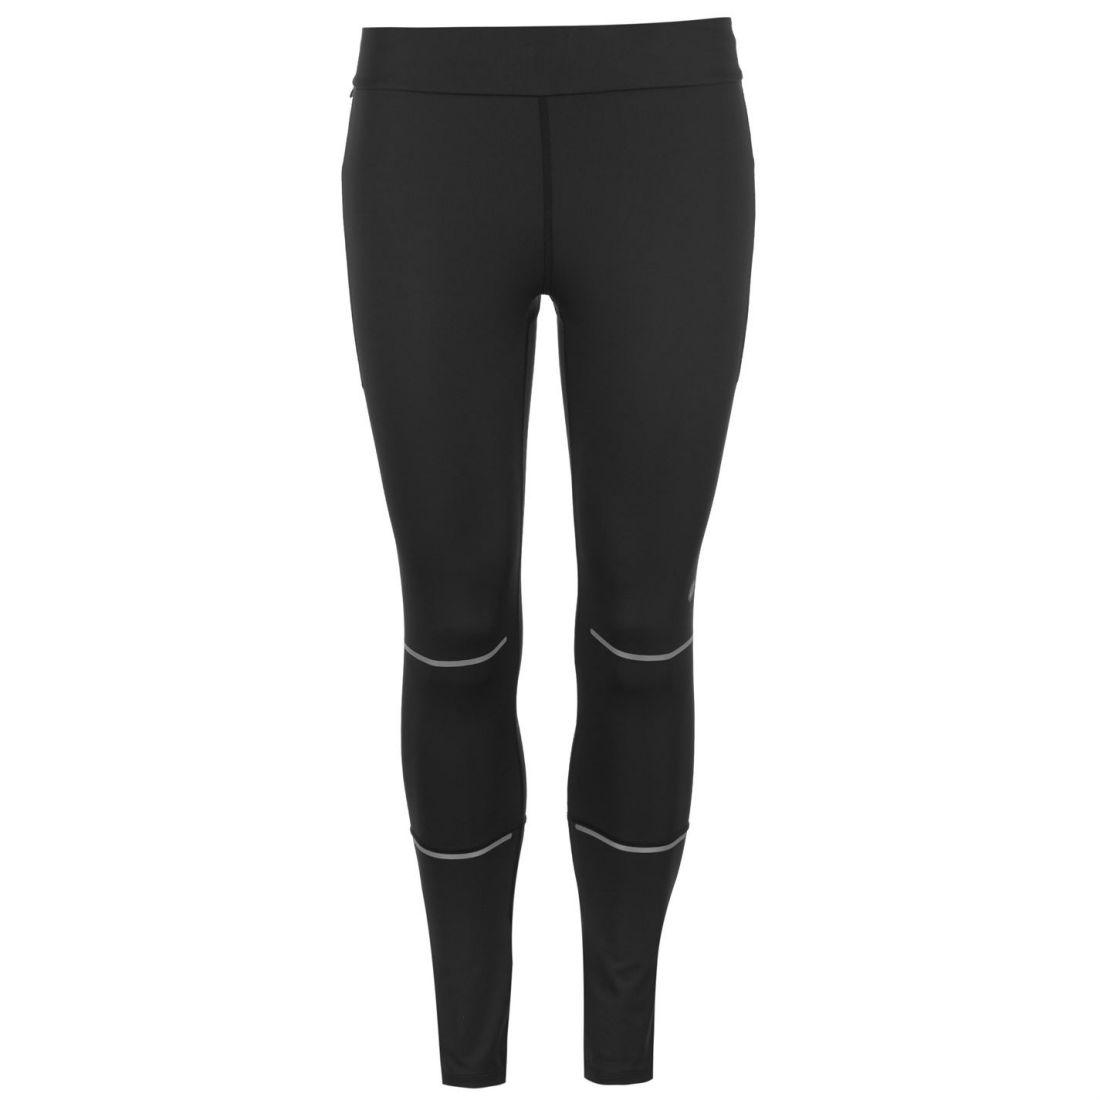 Details about Asics Lite Show 7 8 Tights Ladies Performance Pants Trousers Bottoms Zip Quick